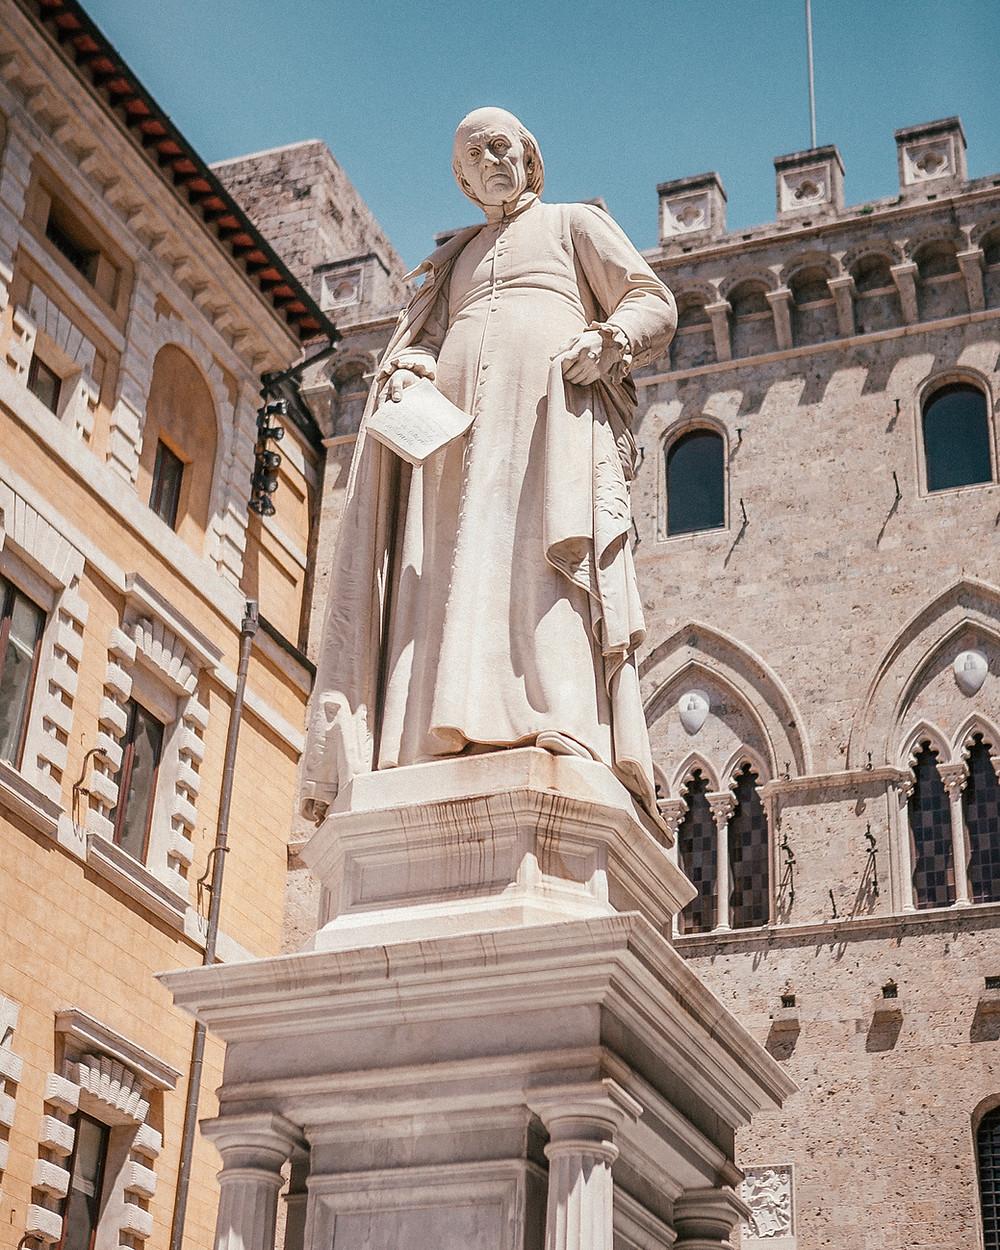 Piazza Salimbeni, Siena, Italy